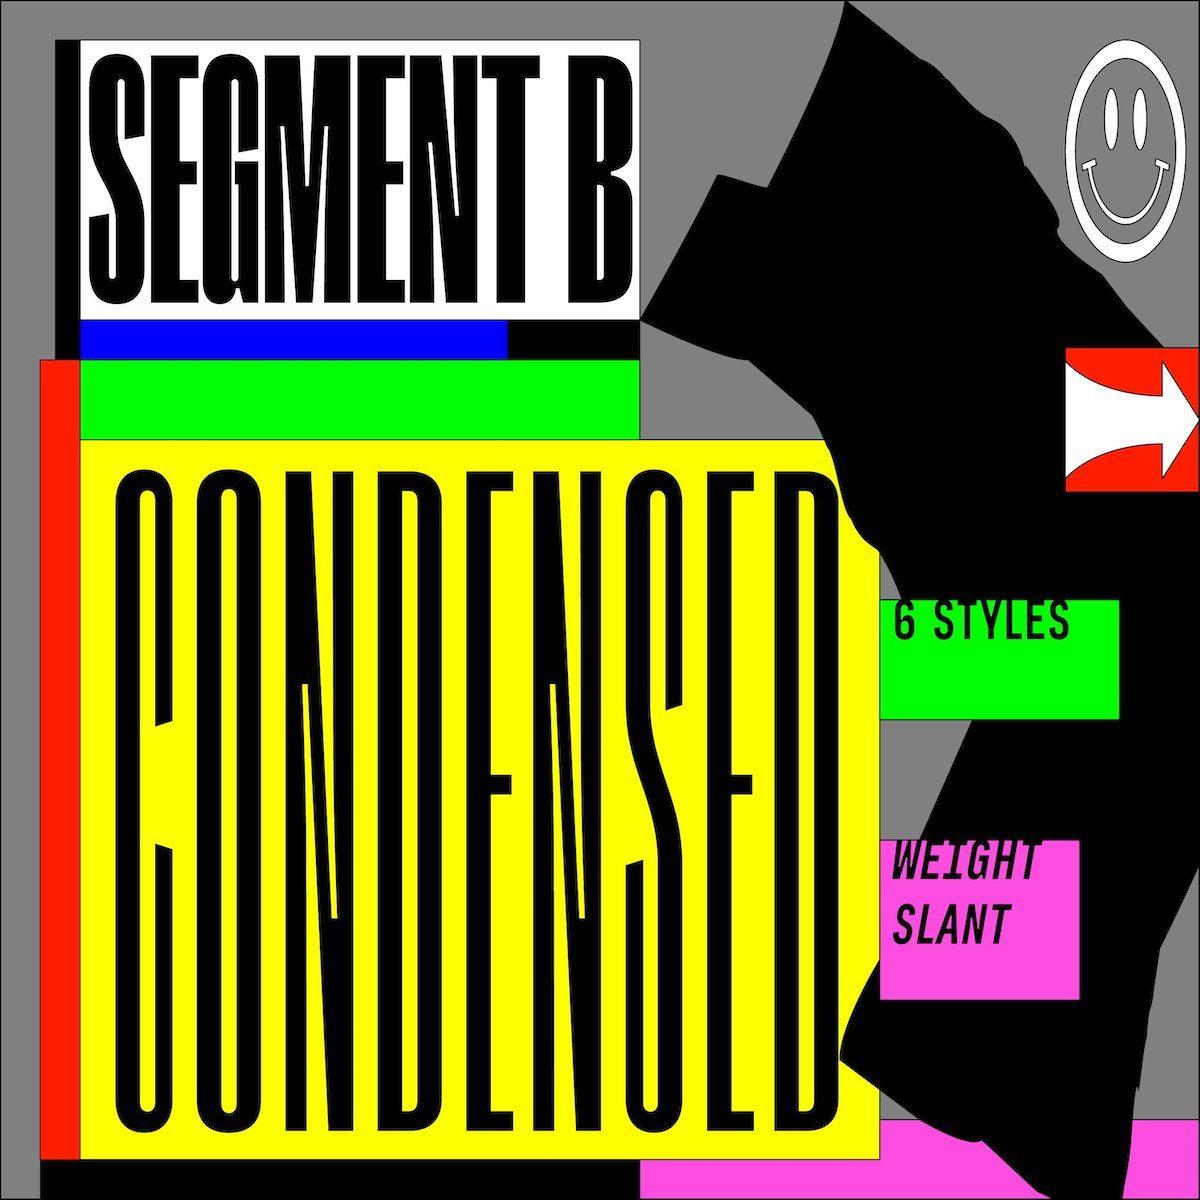 Segment B Typeface - Condensed Style